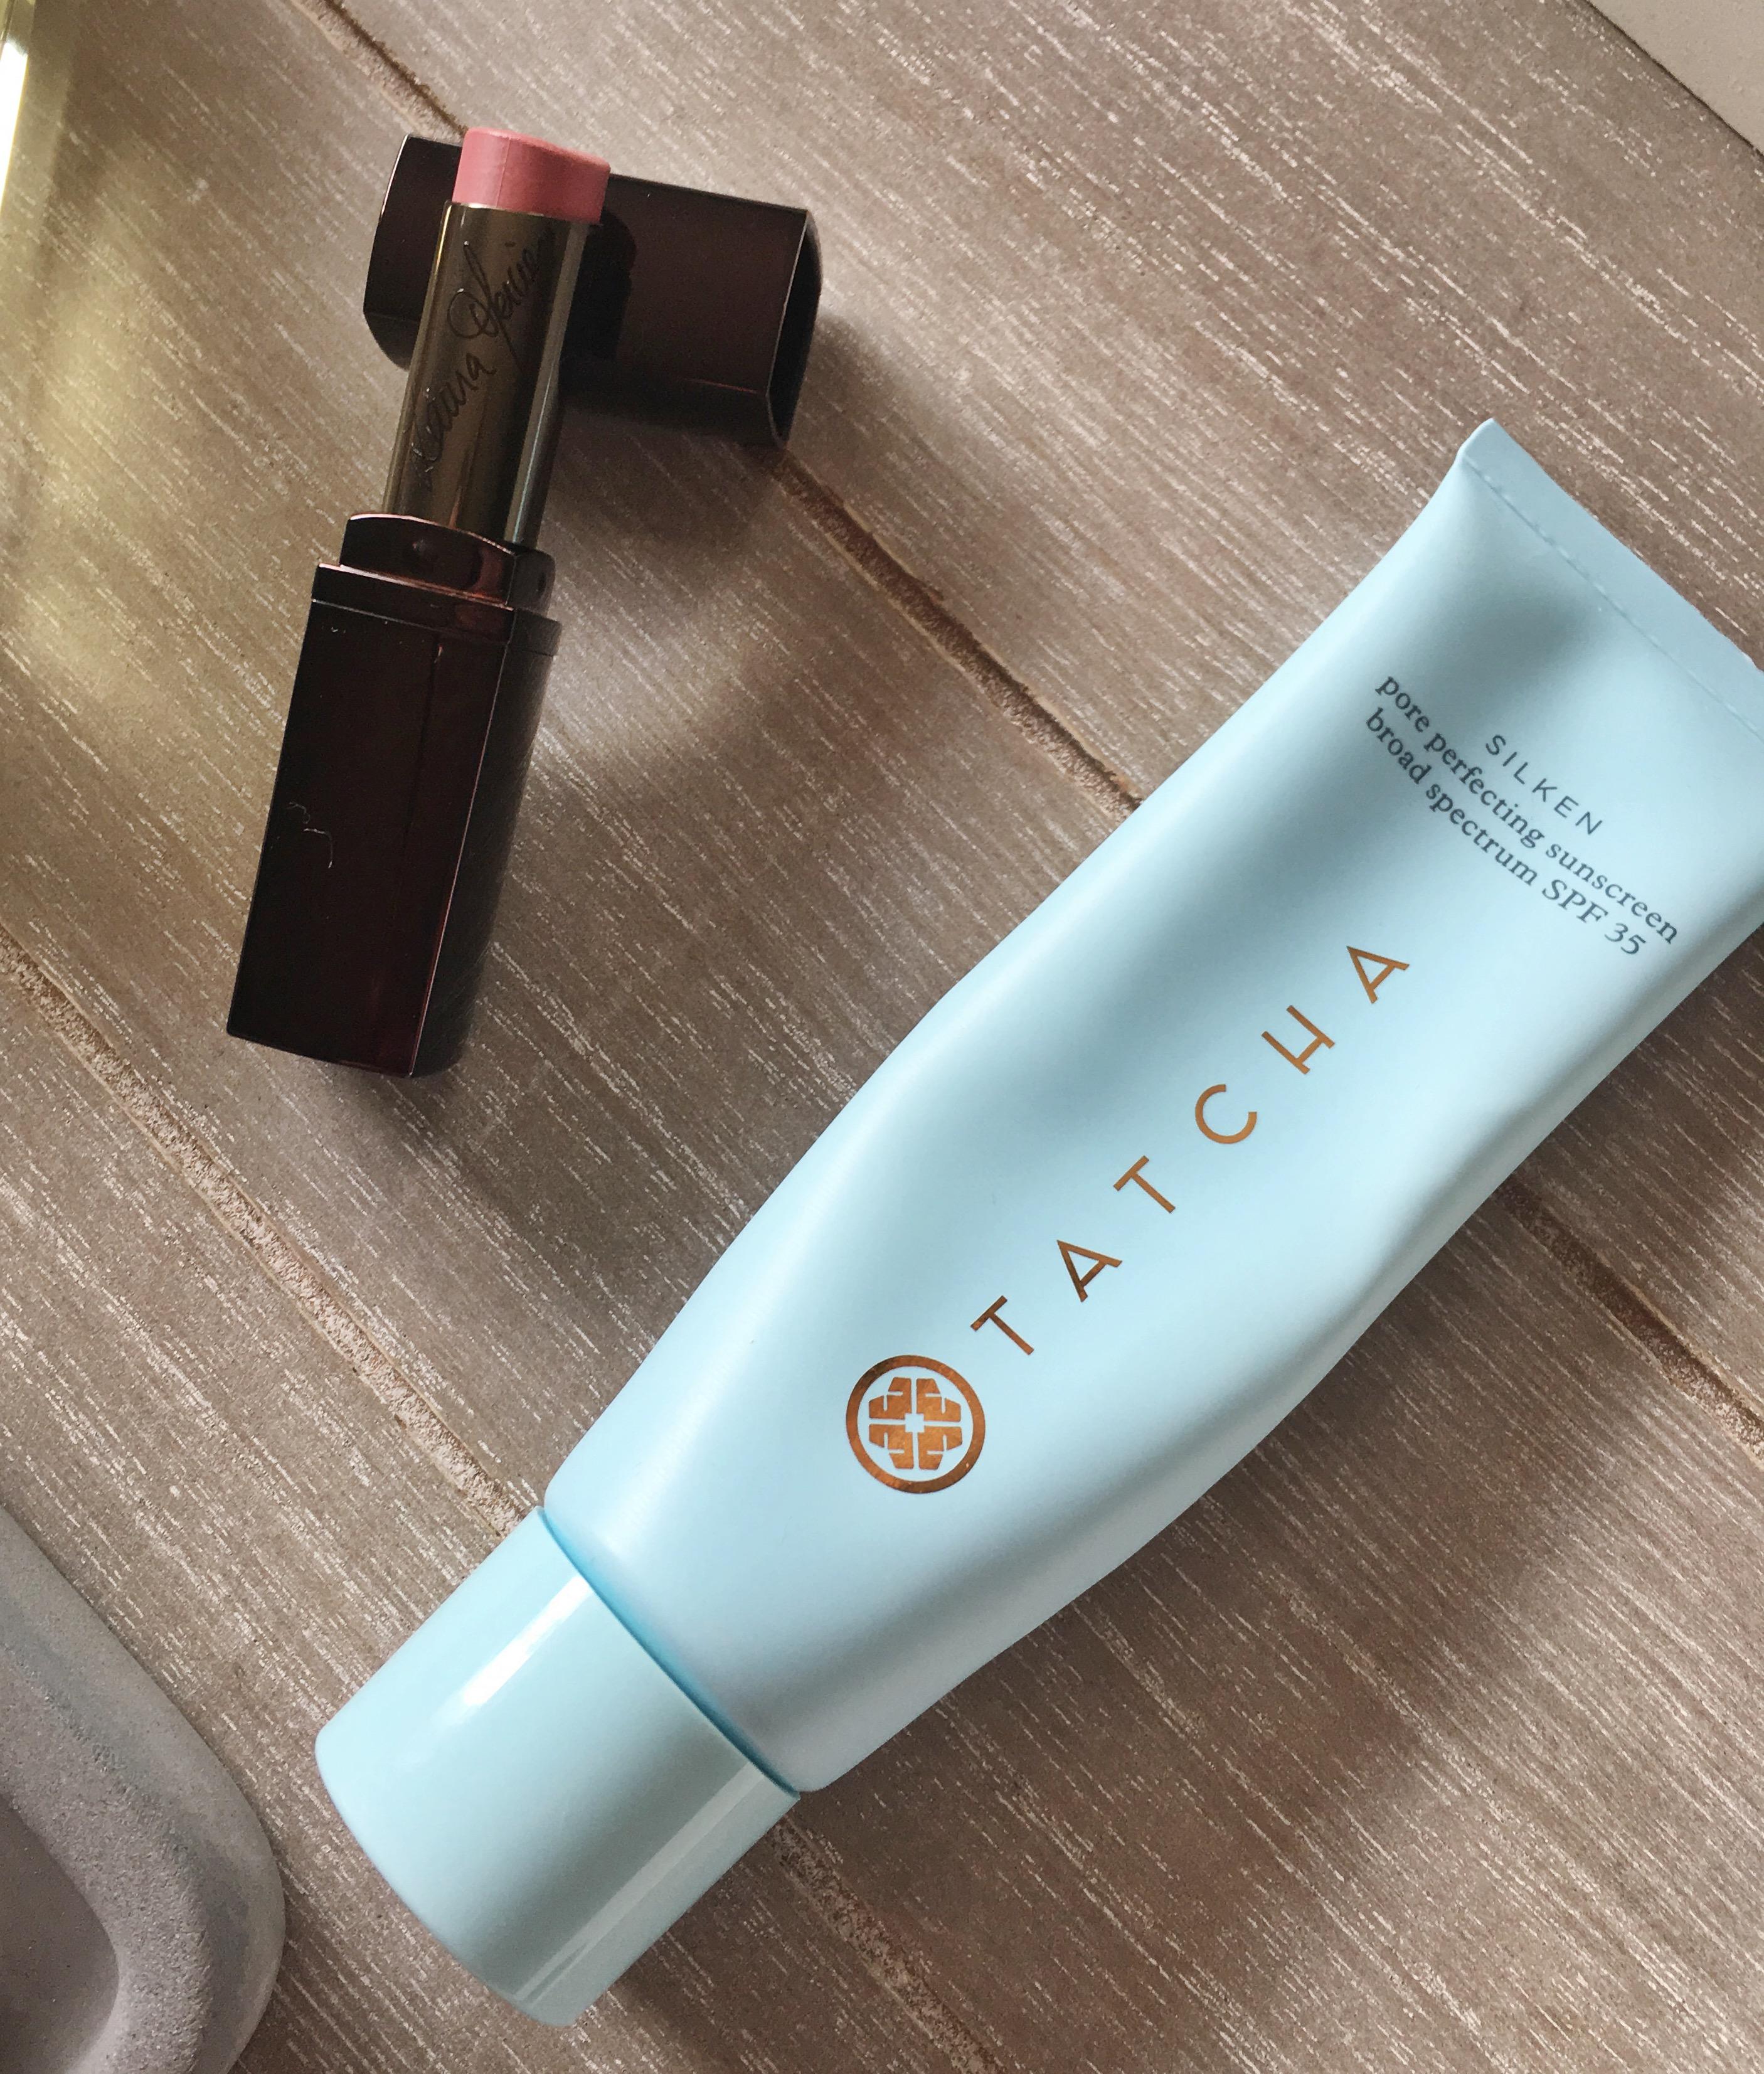 Laura Mercier Lip Parfait Raspberry Ripple, Tatcha Pore Perfecting Sunscreen